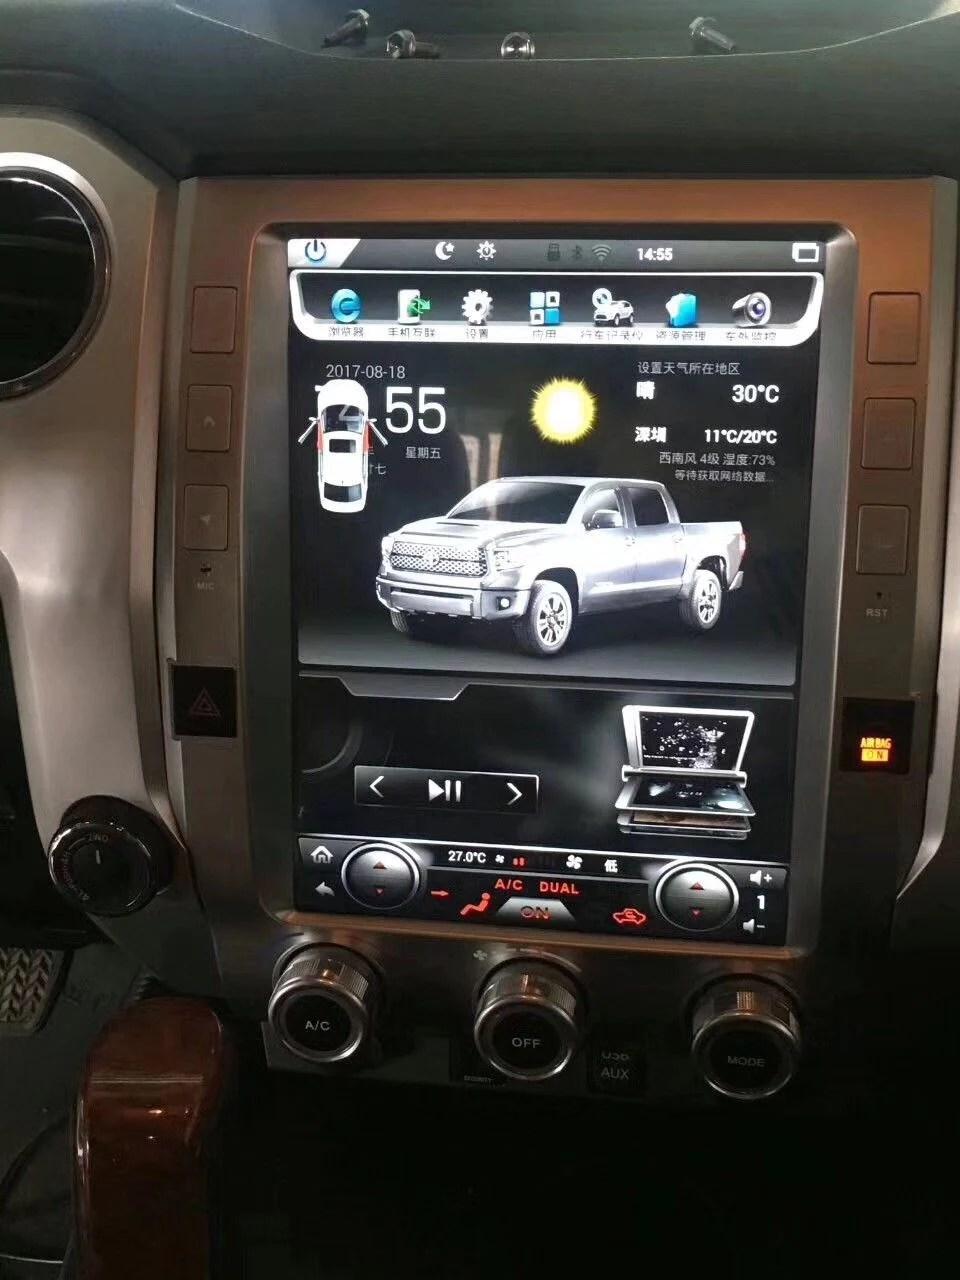 medium resolution of rhino radios toyota tundra 2014 2017 12 1 vertical screen android radio